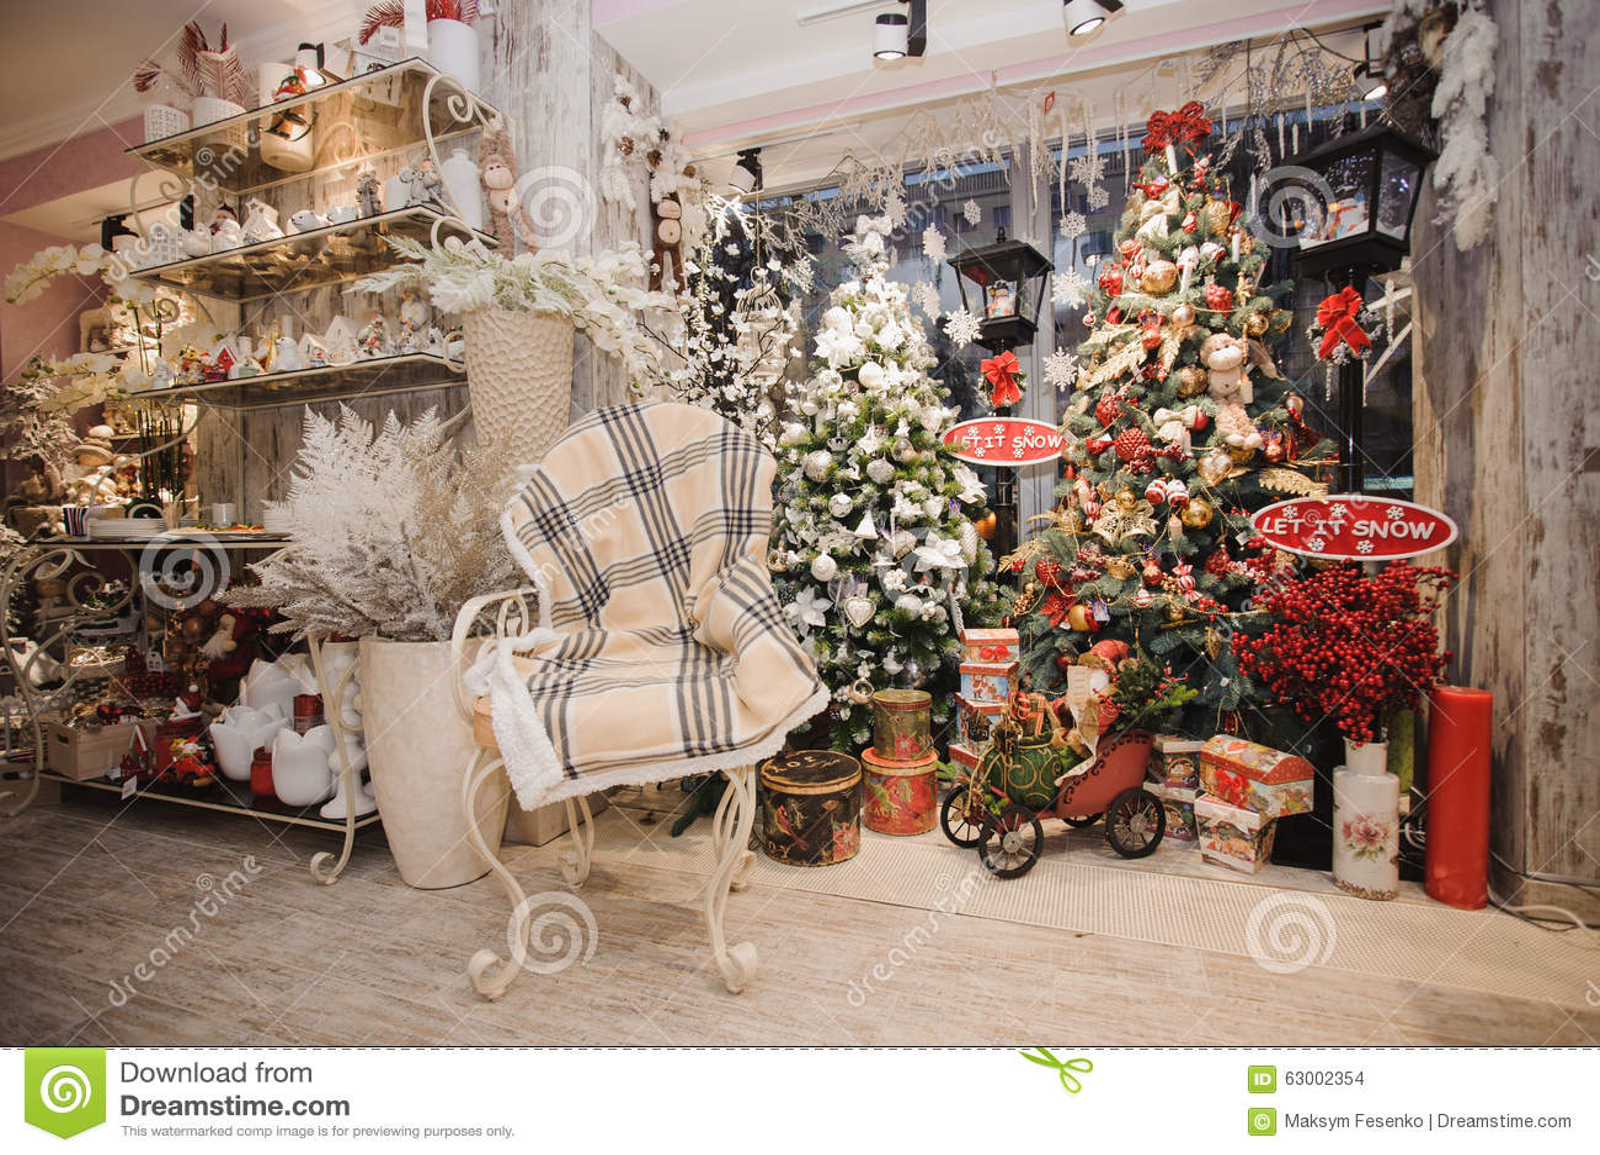 winter home decor. christmas rustic interior. stock photo - image